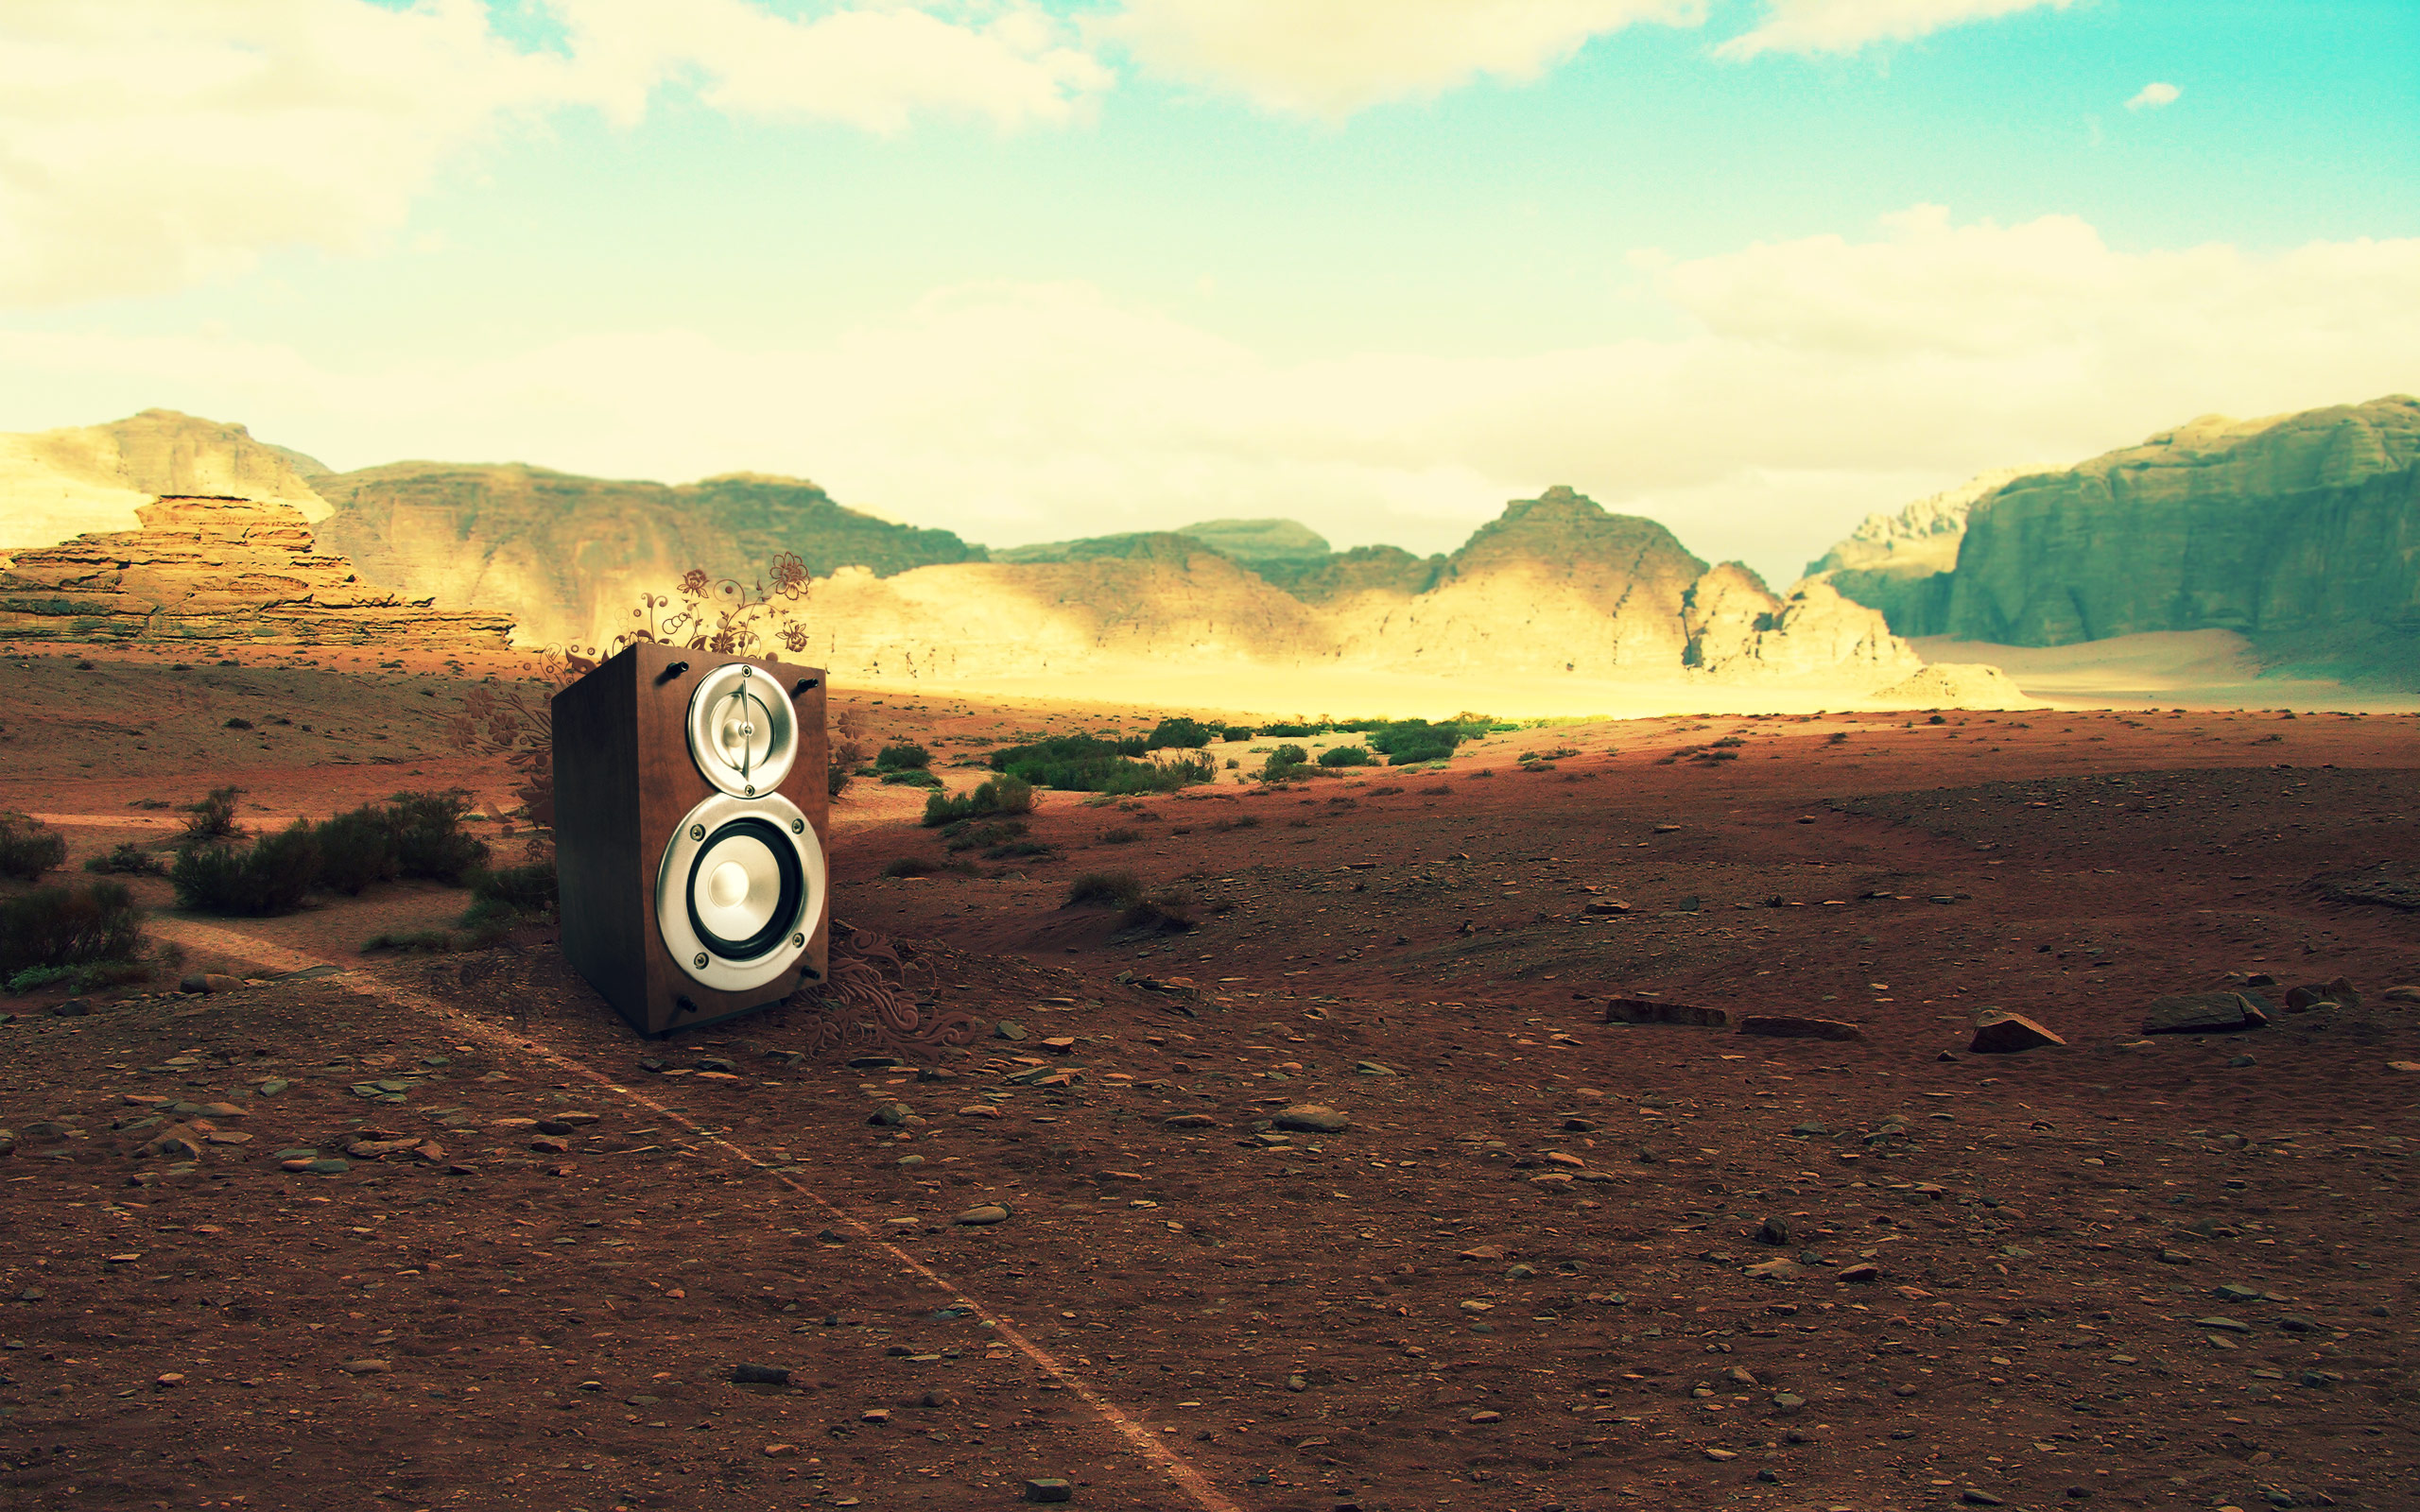 Desert Mountain 2560x1600